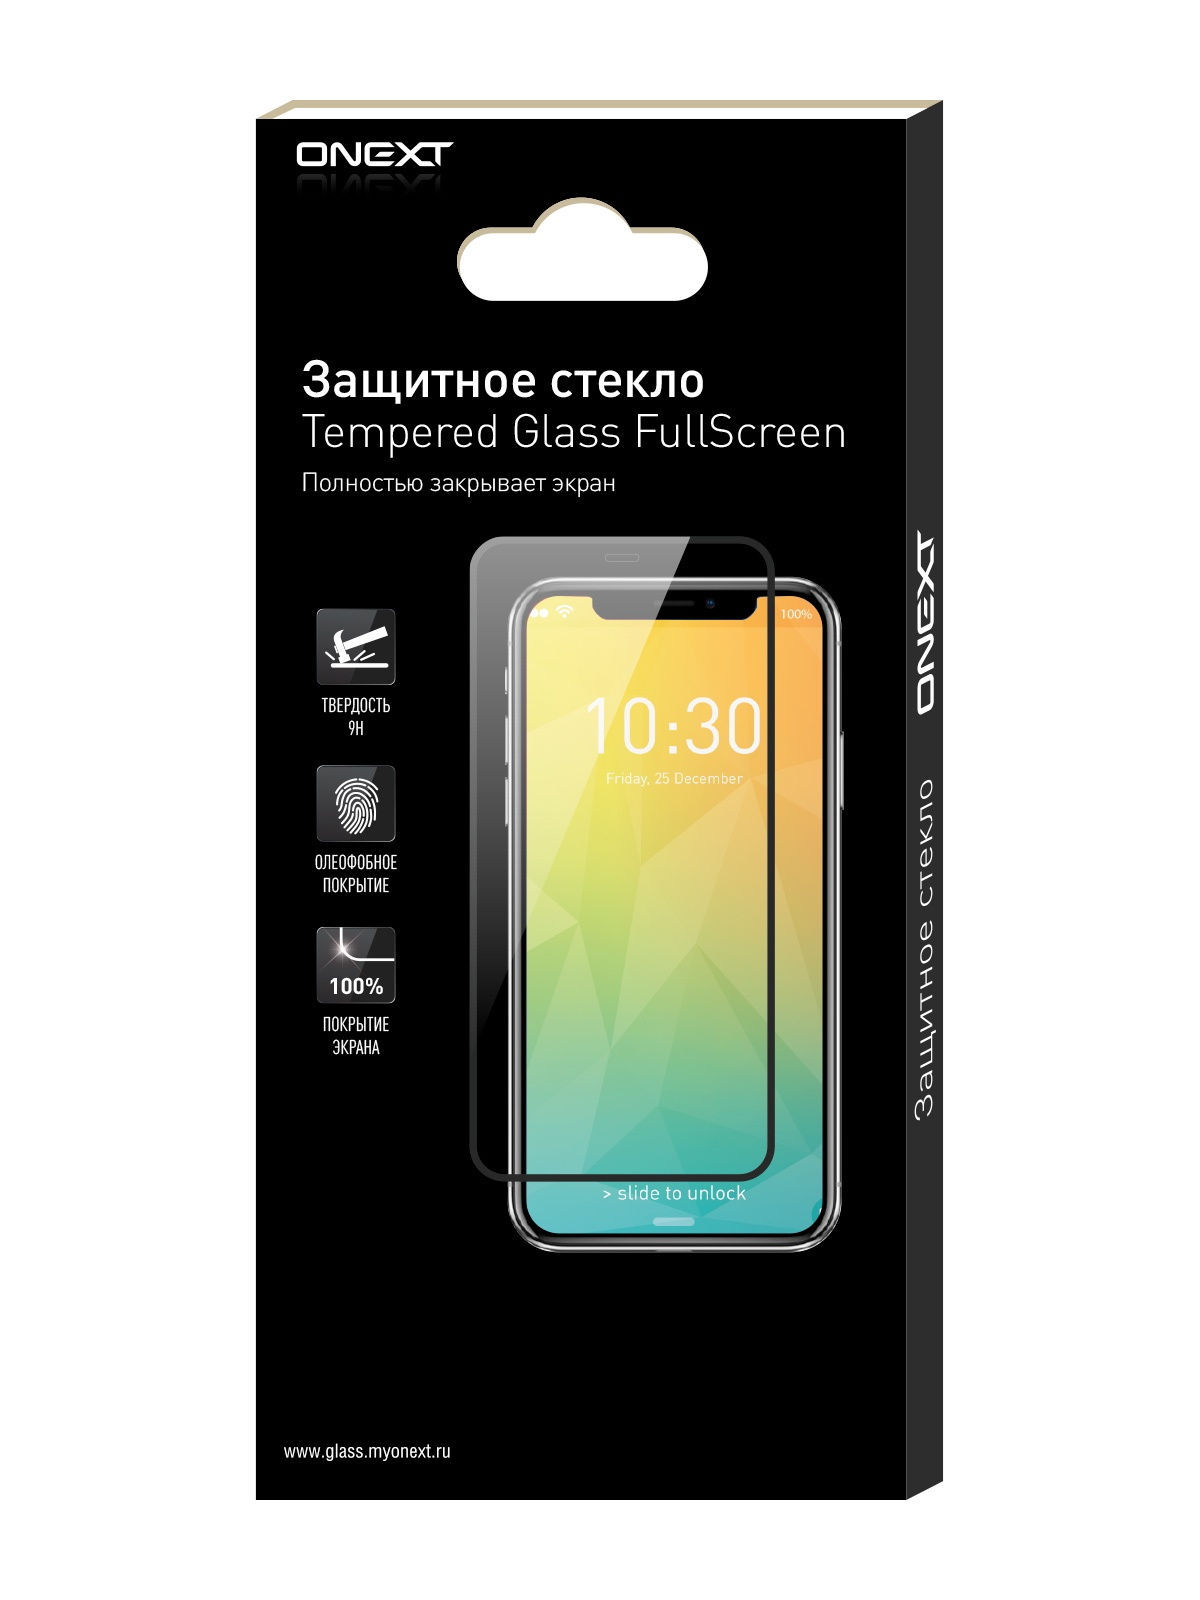 Защитное стекло ONEXT Huawei P10 Lite с рамкой защитное стекло onext huawei p10 с рамкой